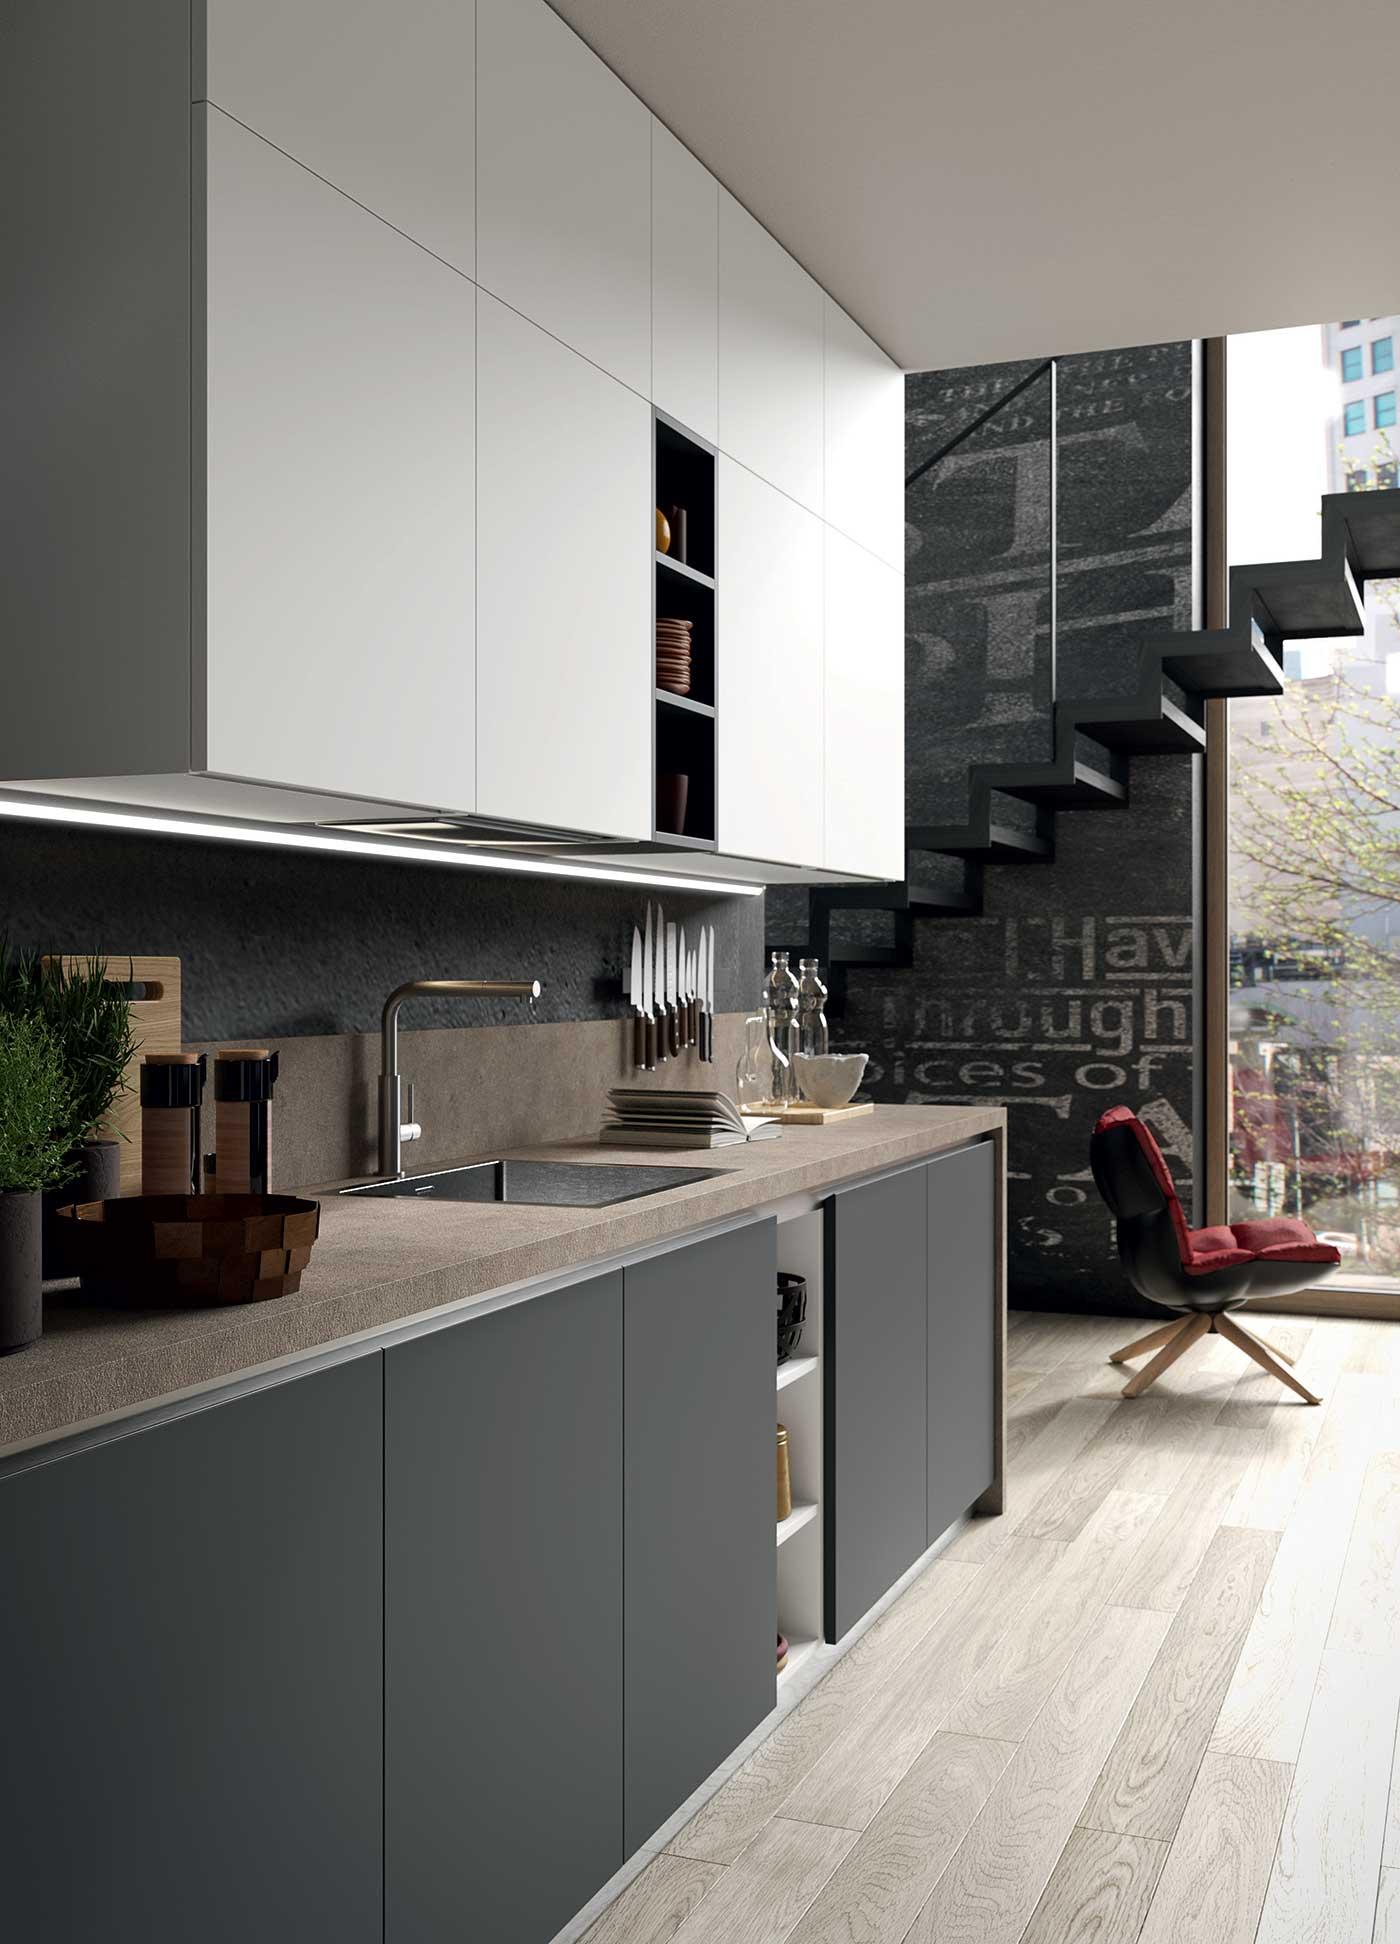 Cucine moderne de sign tecnologia ed eleganza gicinque - Cucine gicinque ...